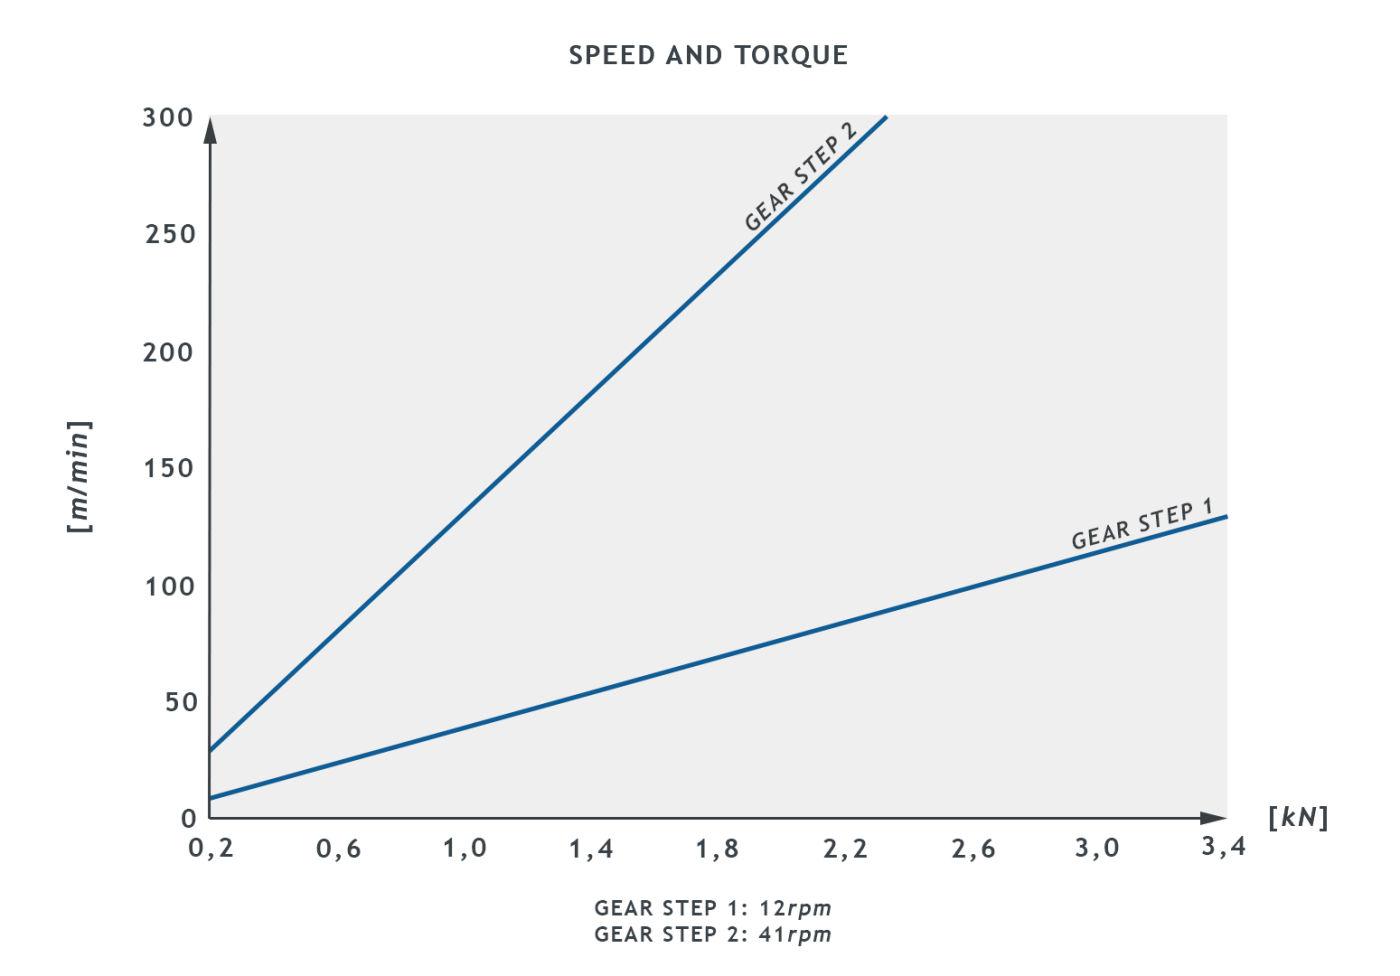 AVR10_SB0405003_SpeedTorque_graph1.jpg